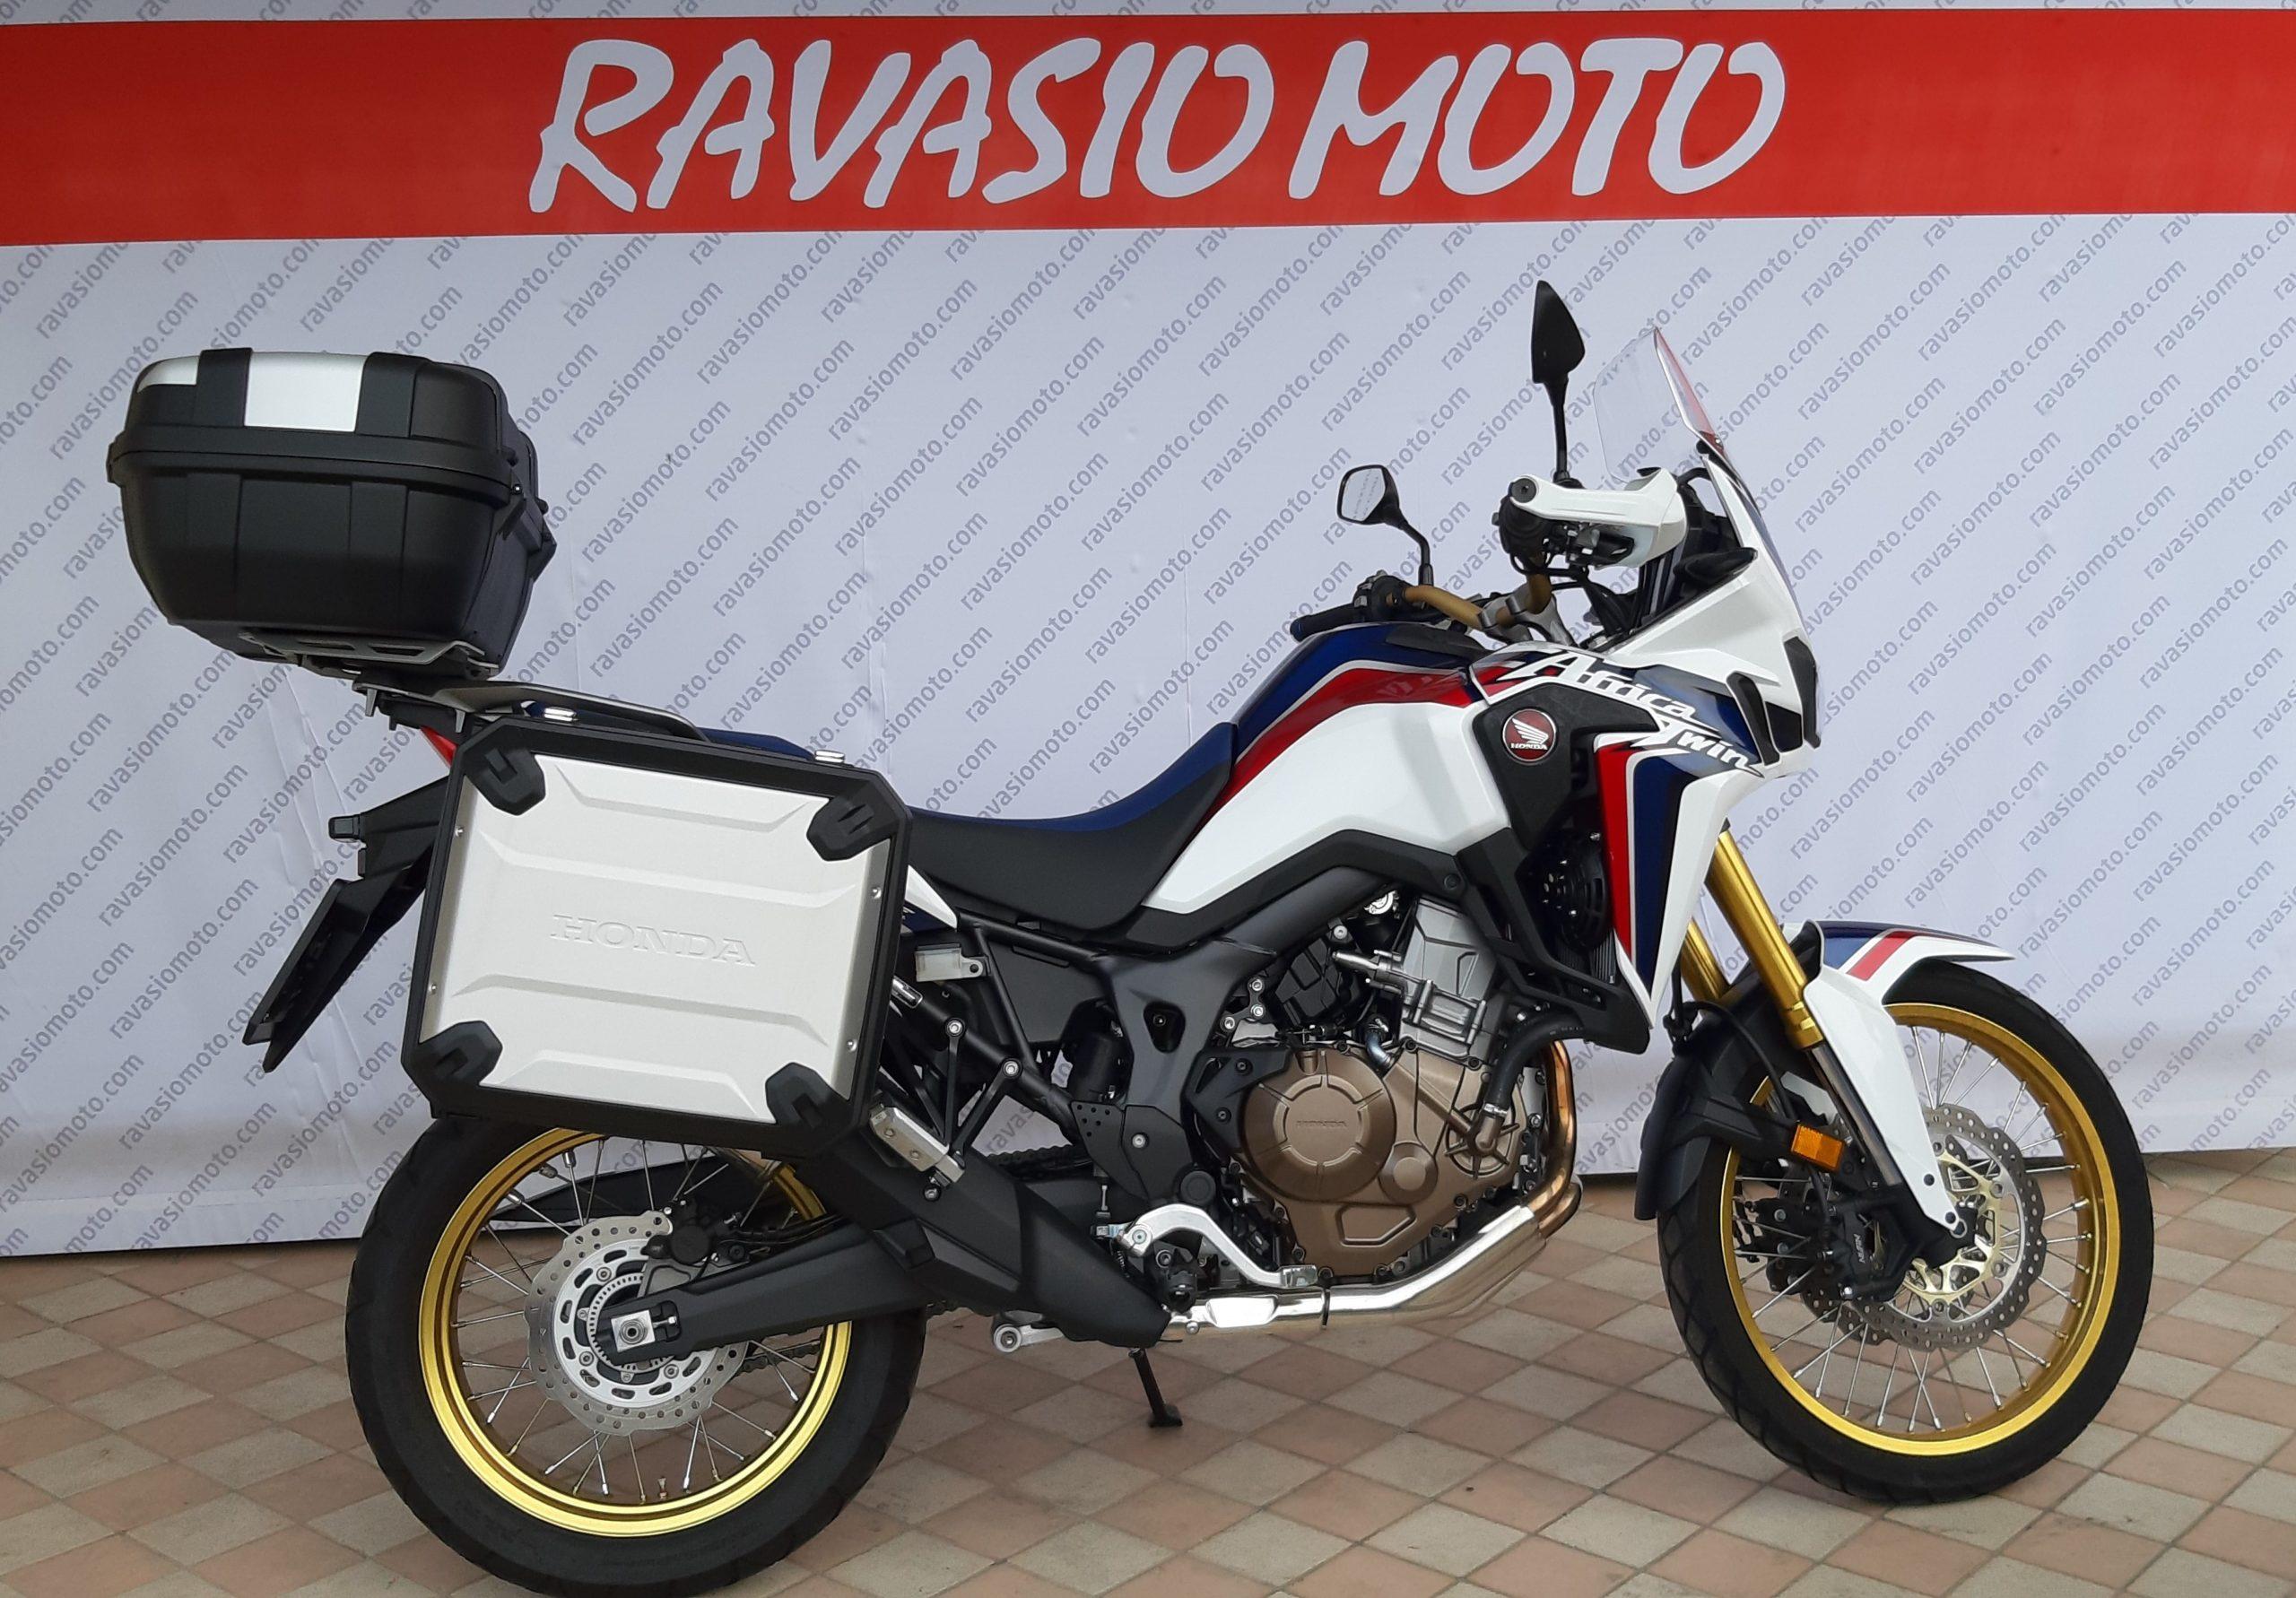 Sissi Moto Crema Usato usato - ravasio moto